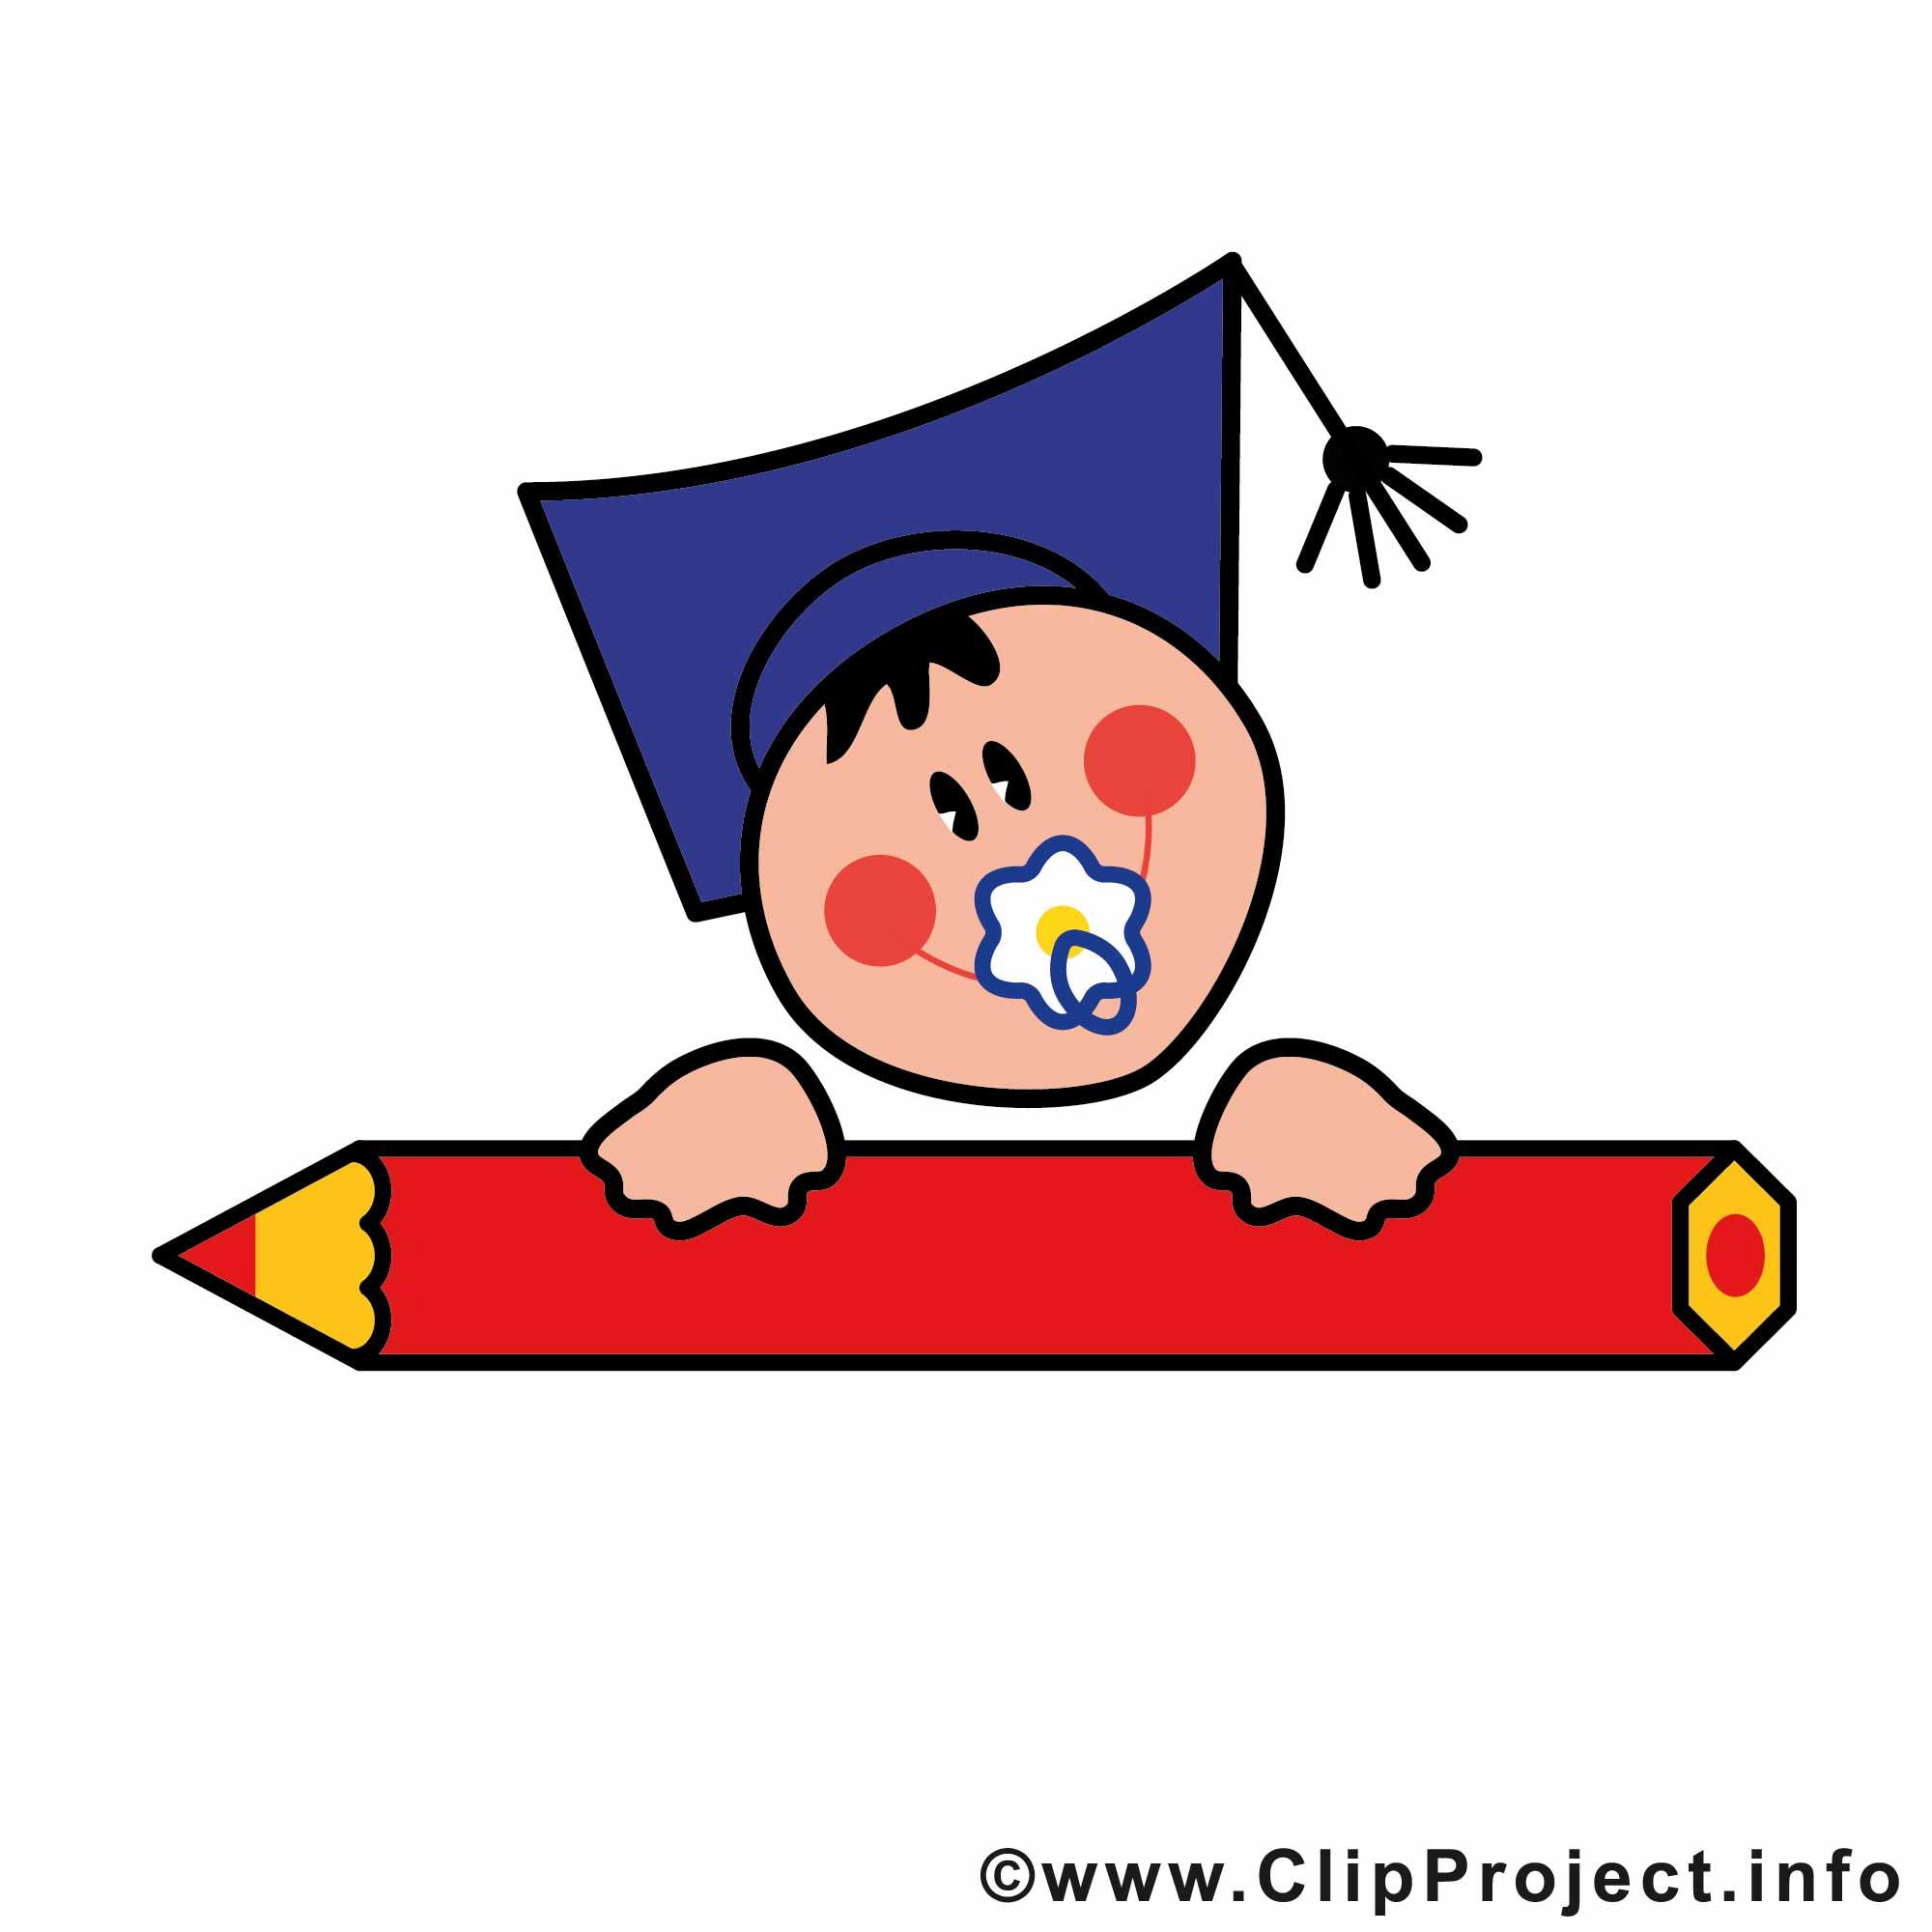 Bilder cliparts cartoons grafiken. Abschied clipart schule